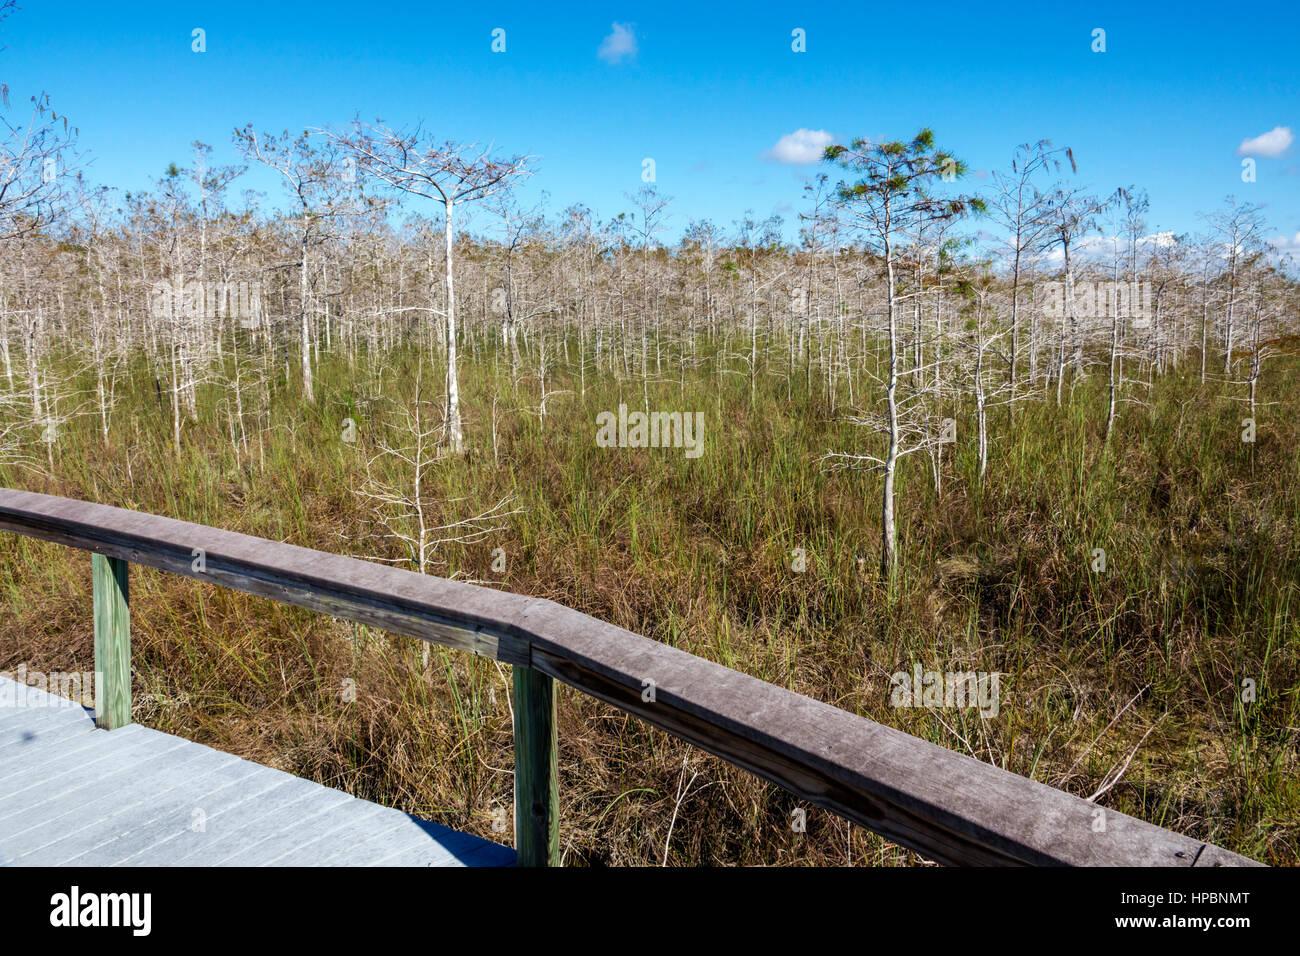 Florida Everglades National Park trail freshwater marl prairie dwarf cypress boardwalk - Stock Image